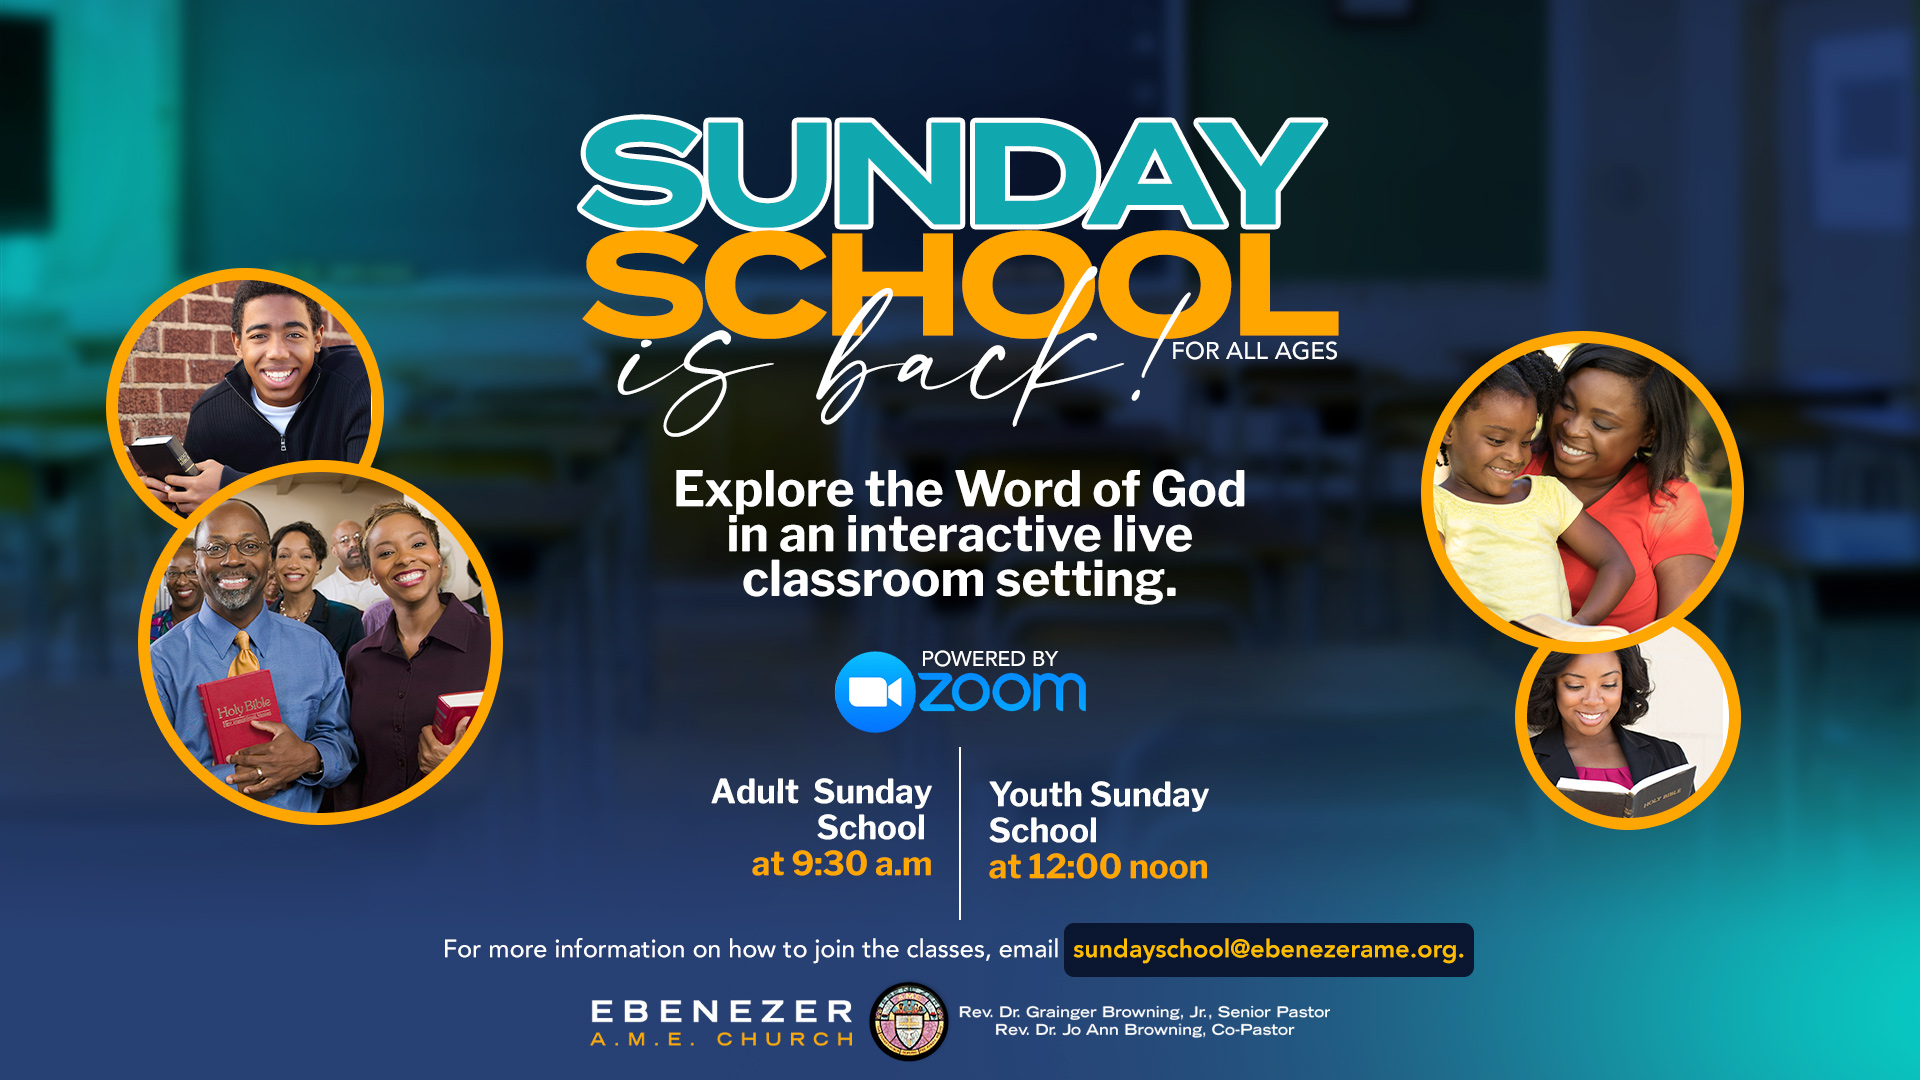 Sunday School is Back